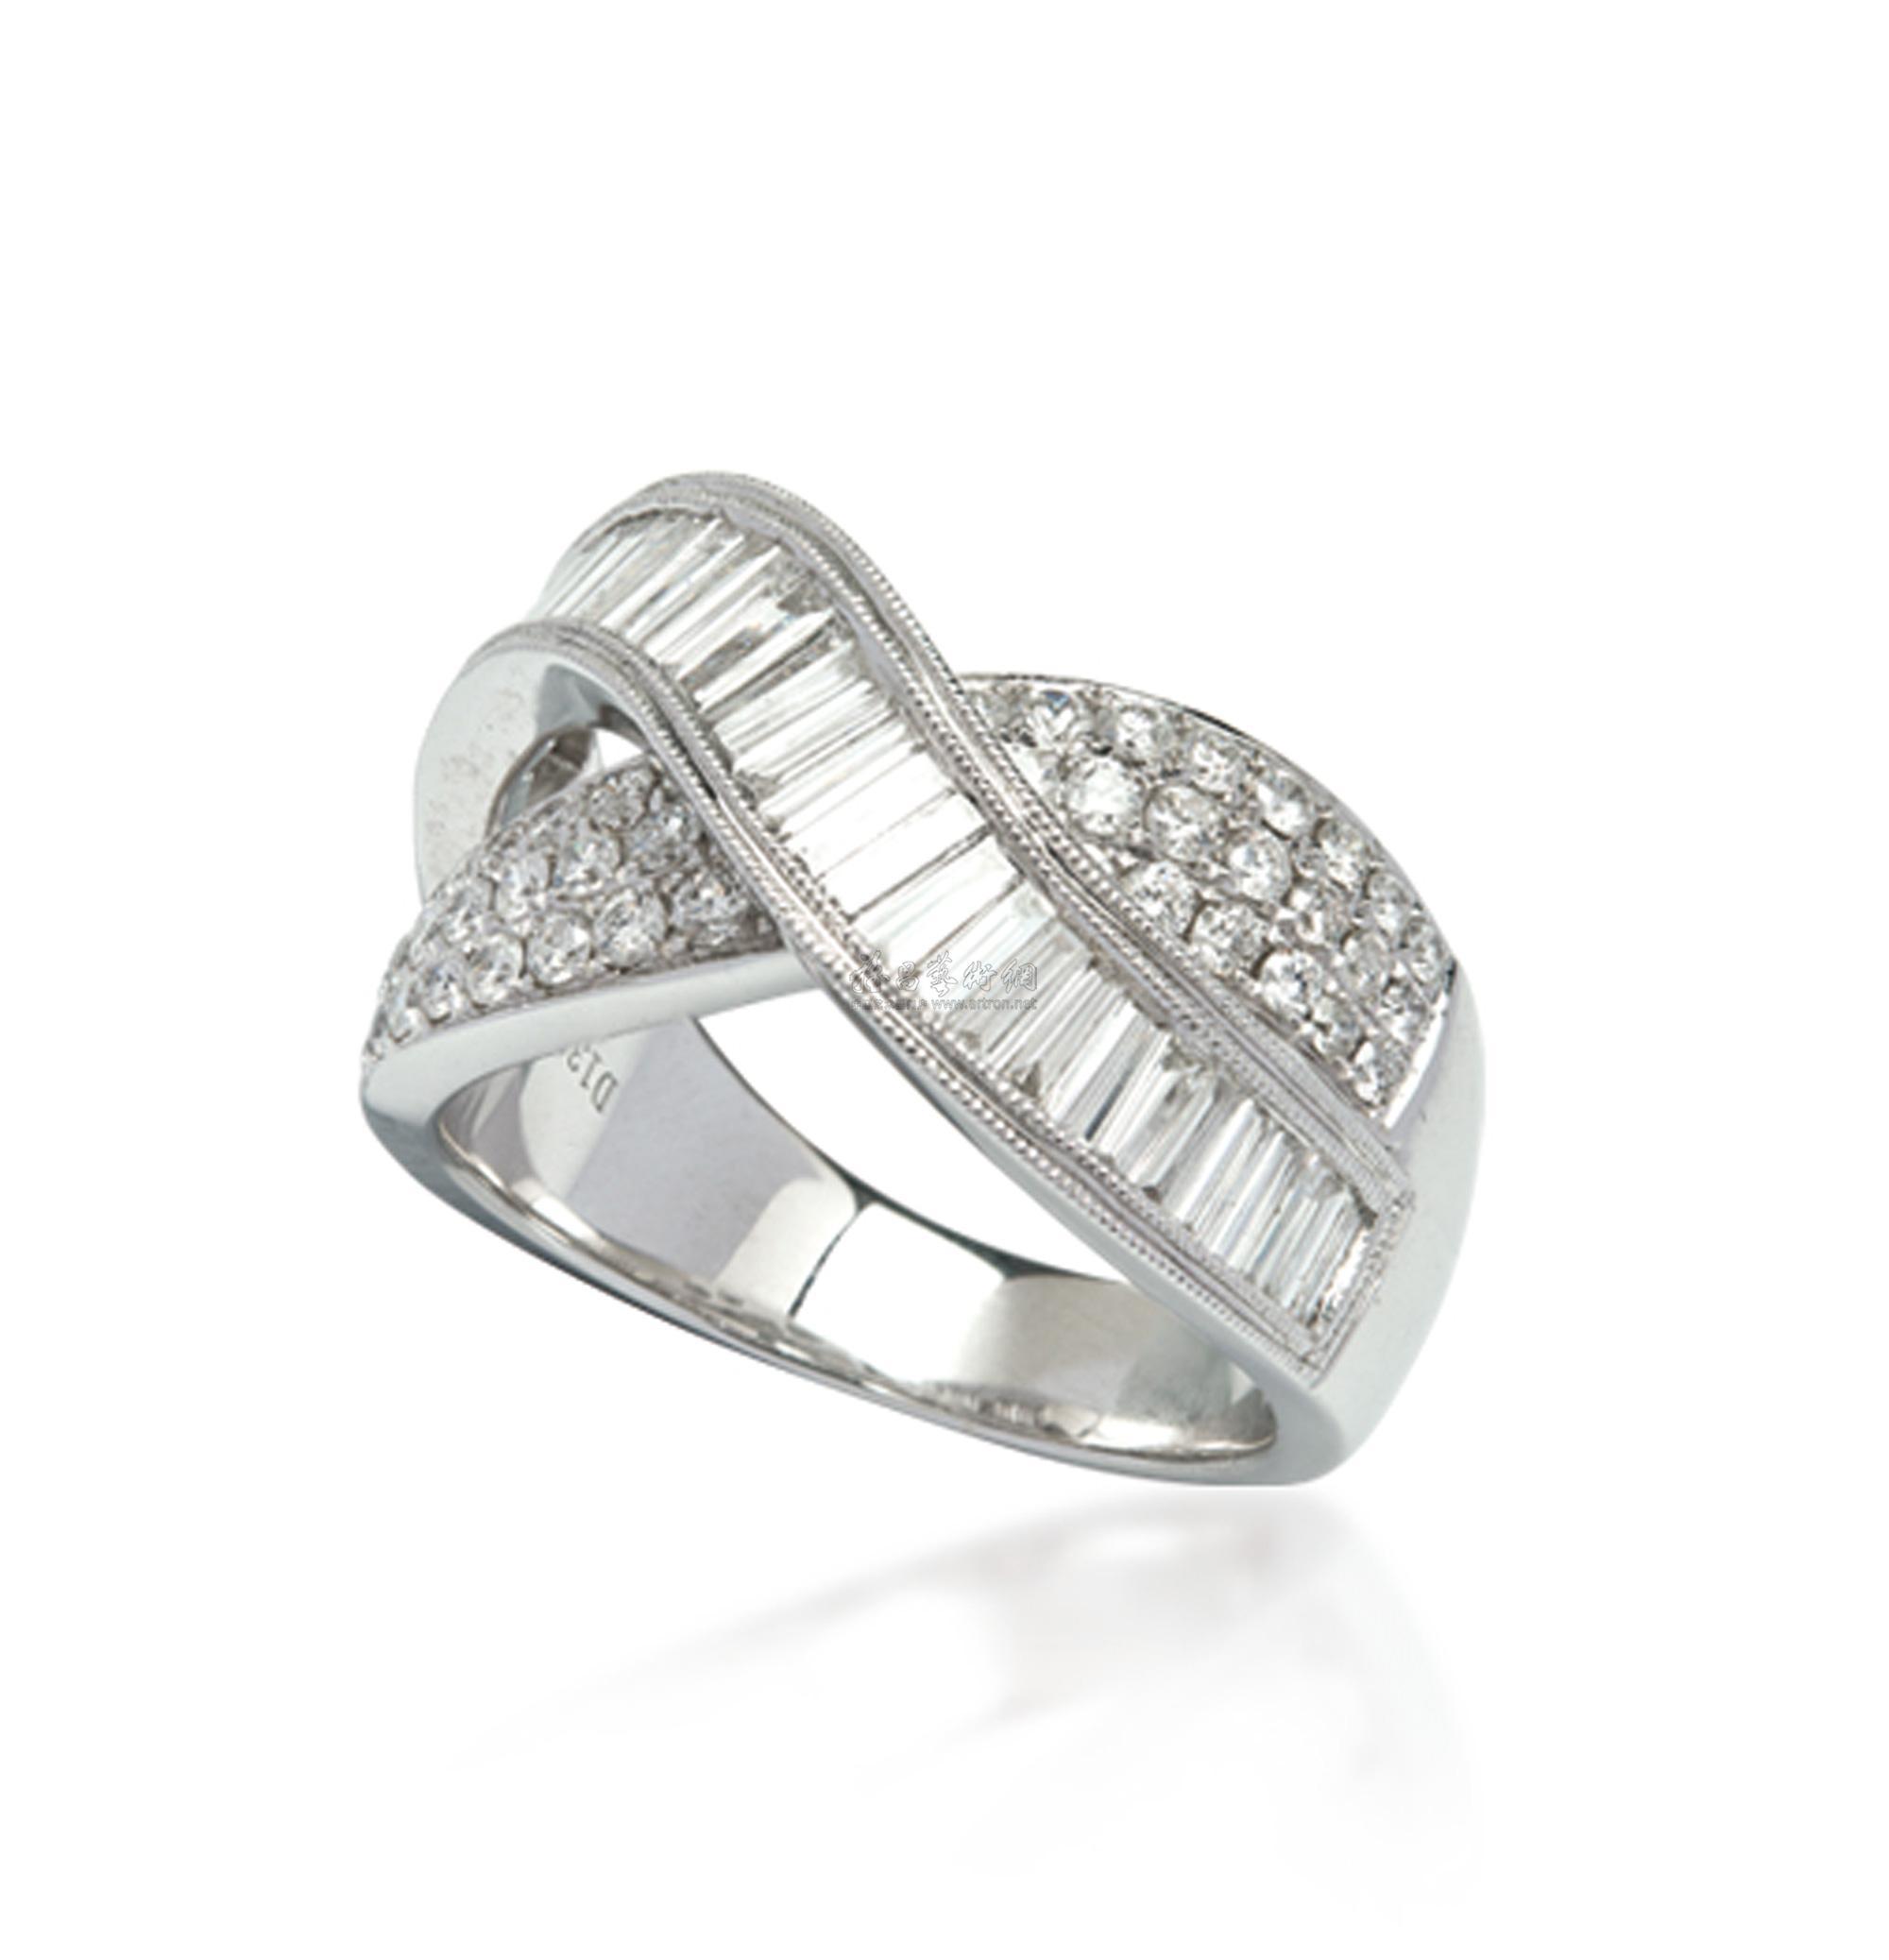 【18k白金钻石戒指】拍卖品